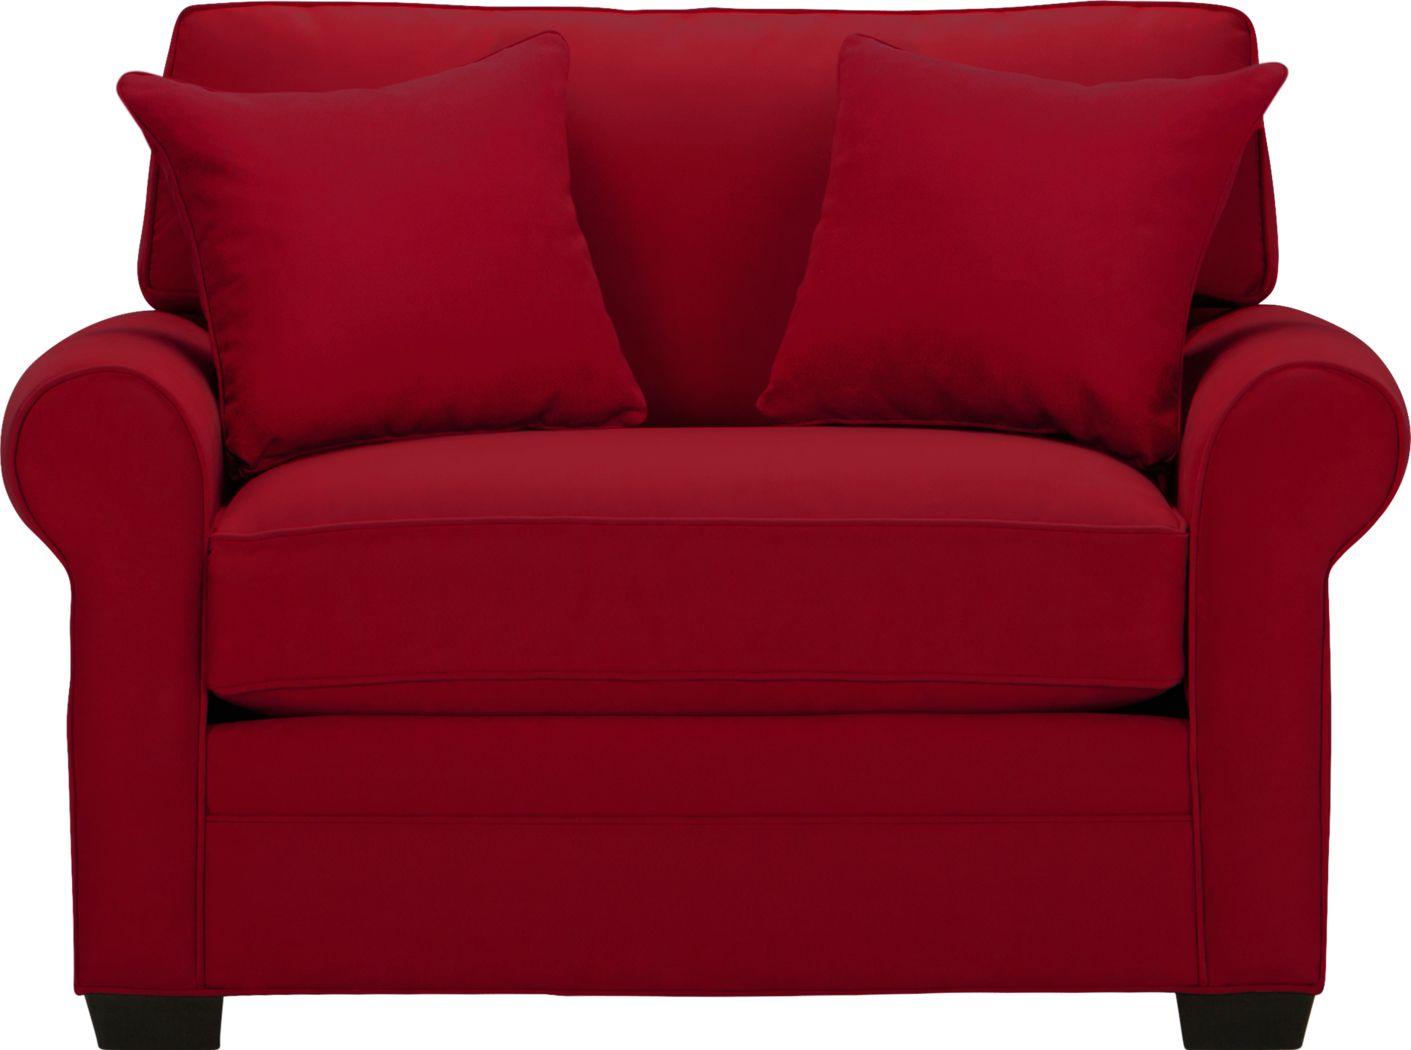 Cindy Crawford Home Bellingham Cardinal Microfiber Sleeper Chair